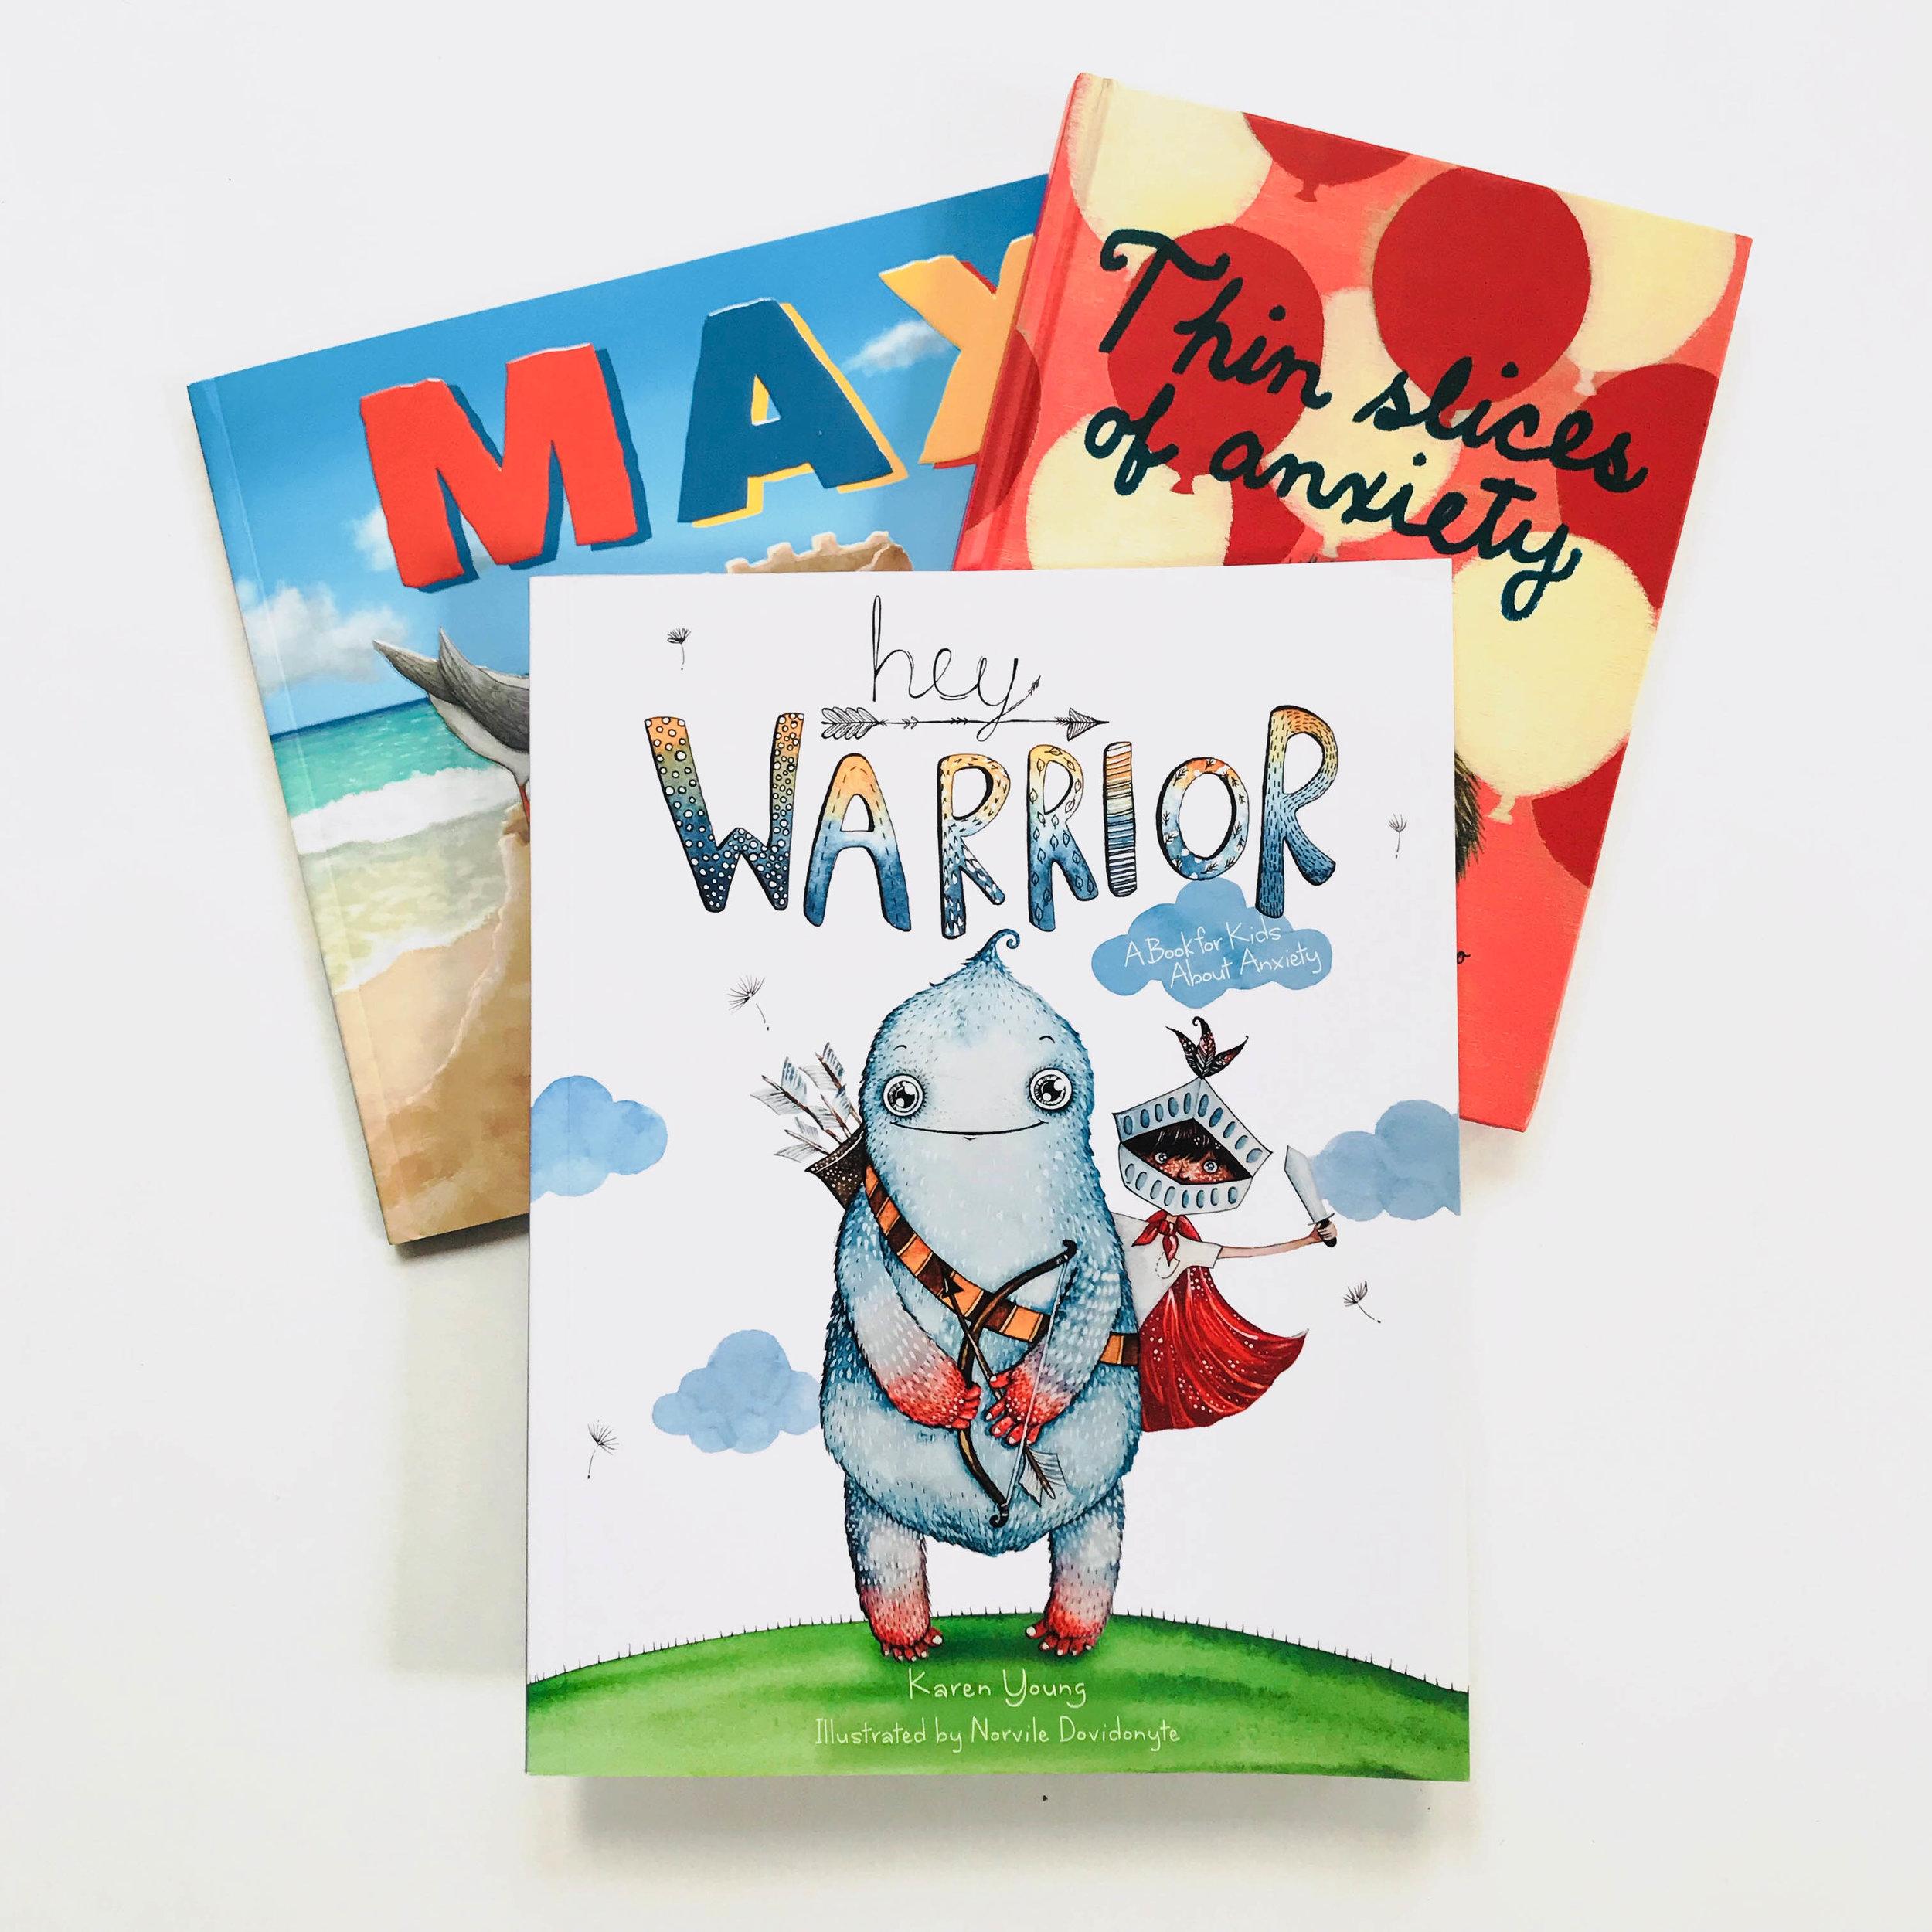 picture books for taming anxiety a friendly affair rh afriendlyaffair com